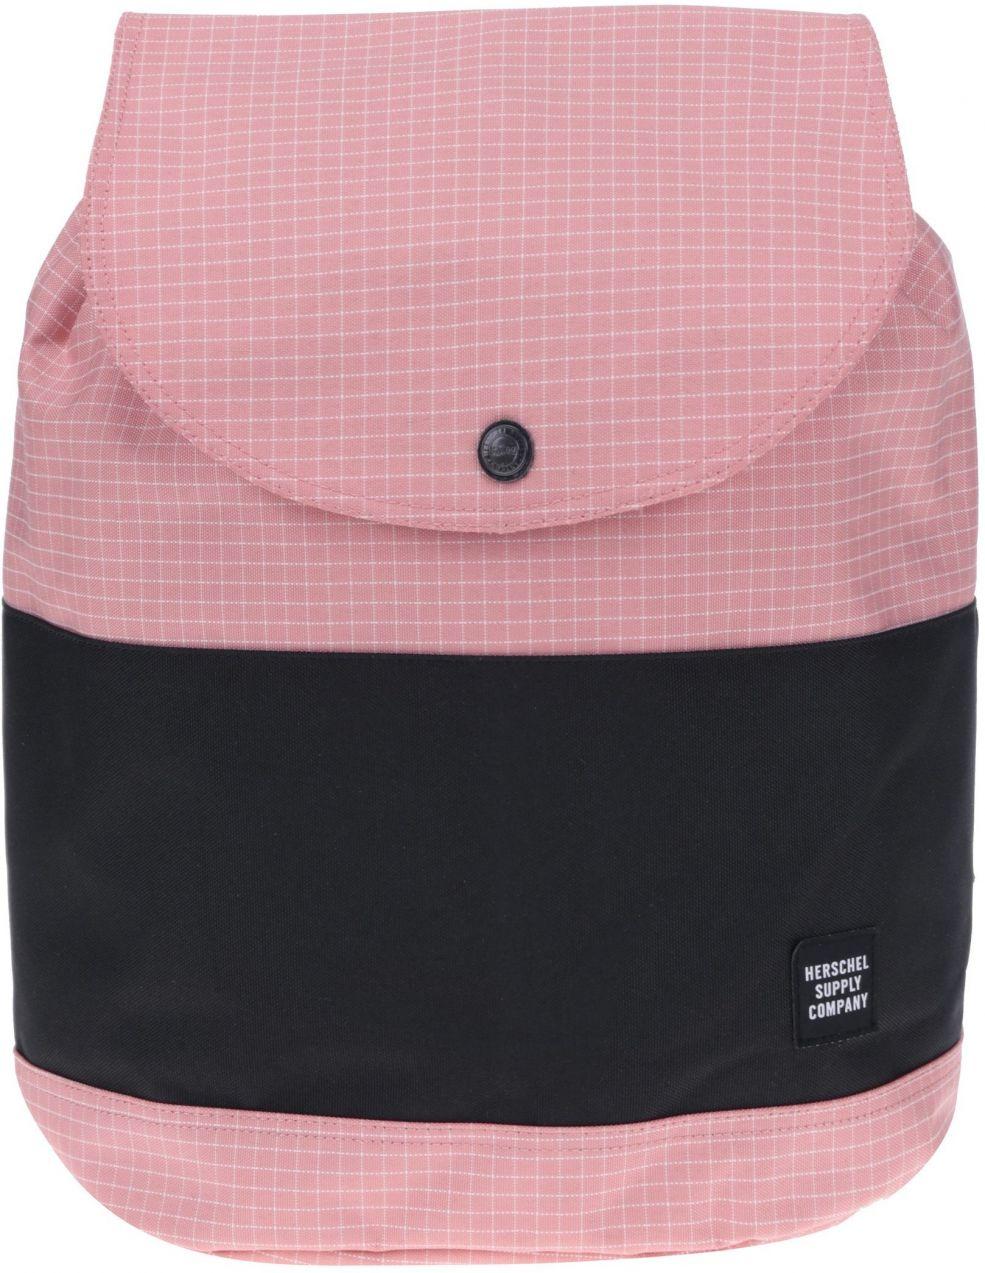 Čierno-ružový kockovaný batoh Herschel Reid 21 l značky Herschel - Lovely.sk da360b2b452